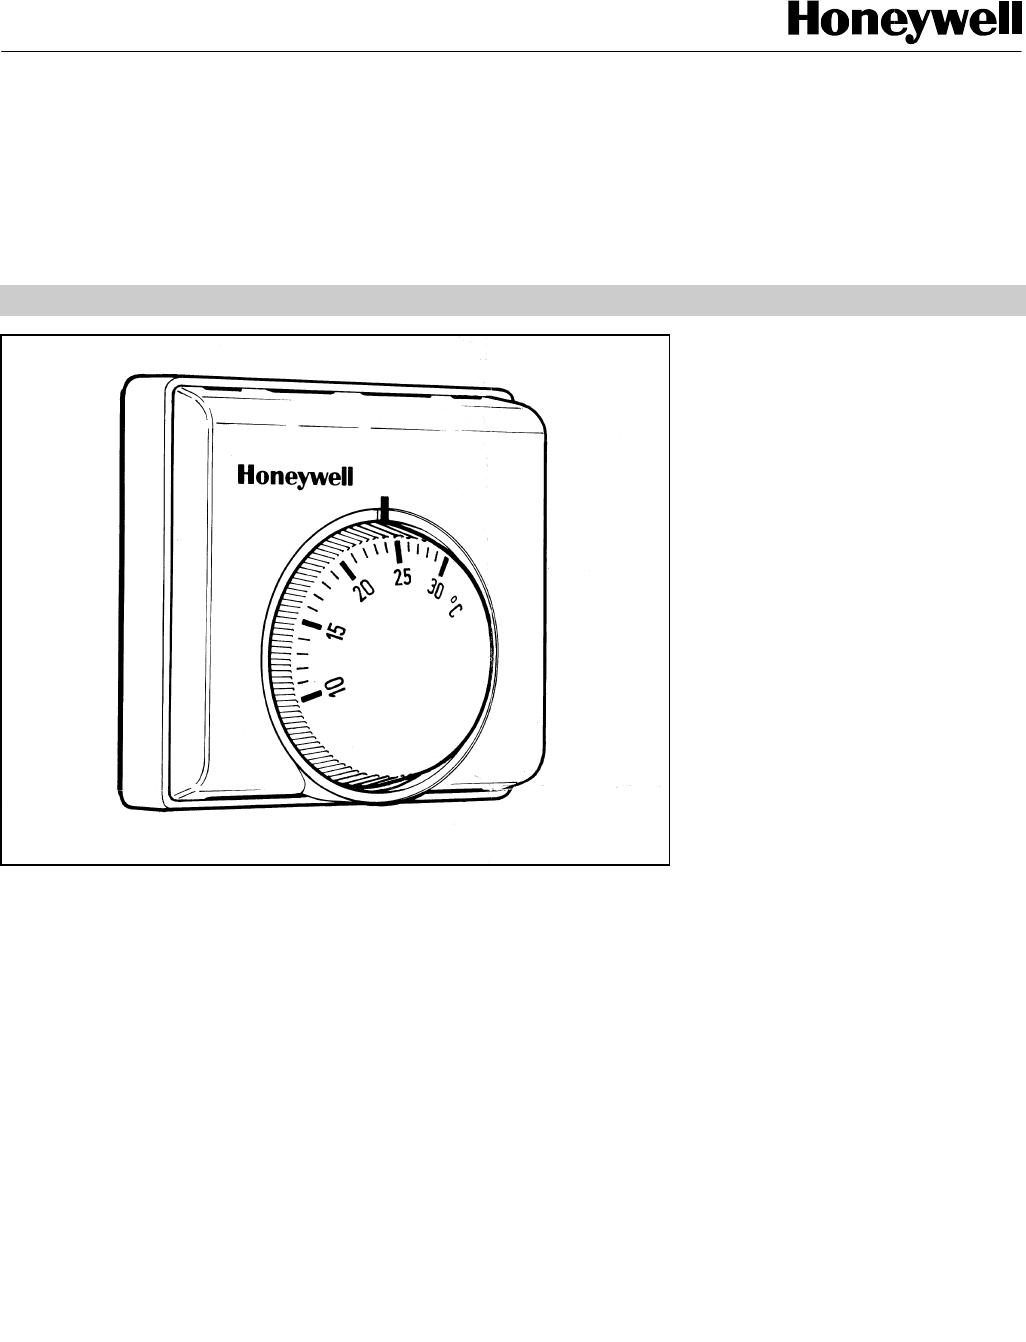 Wiring Honeywell T6360 Room Thermostat